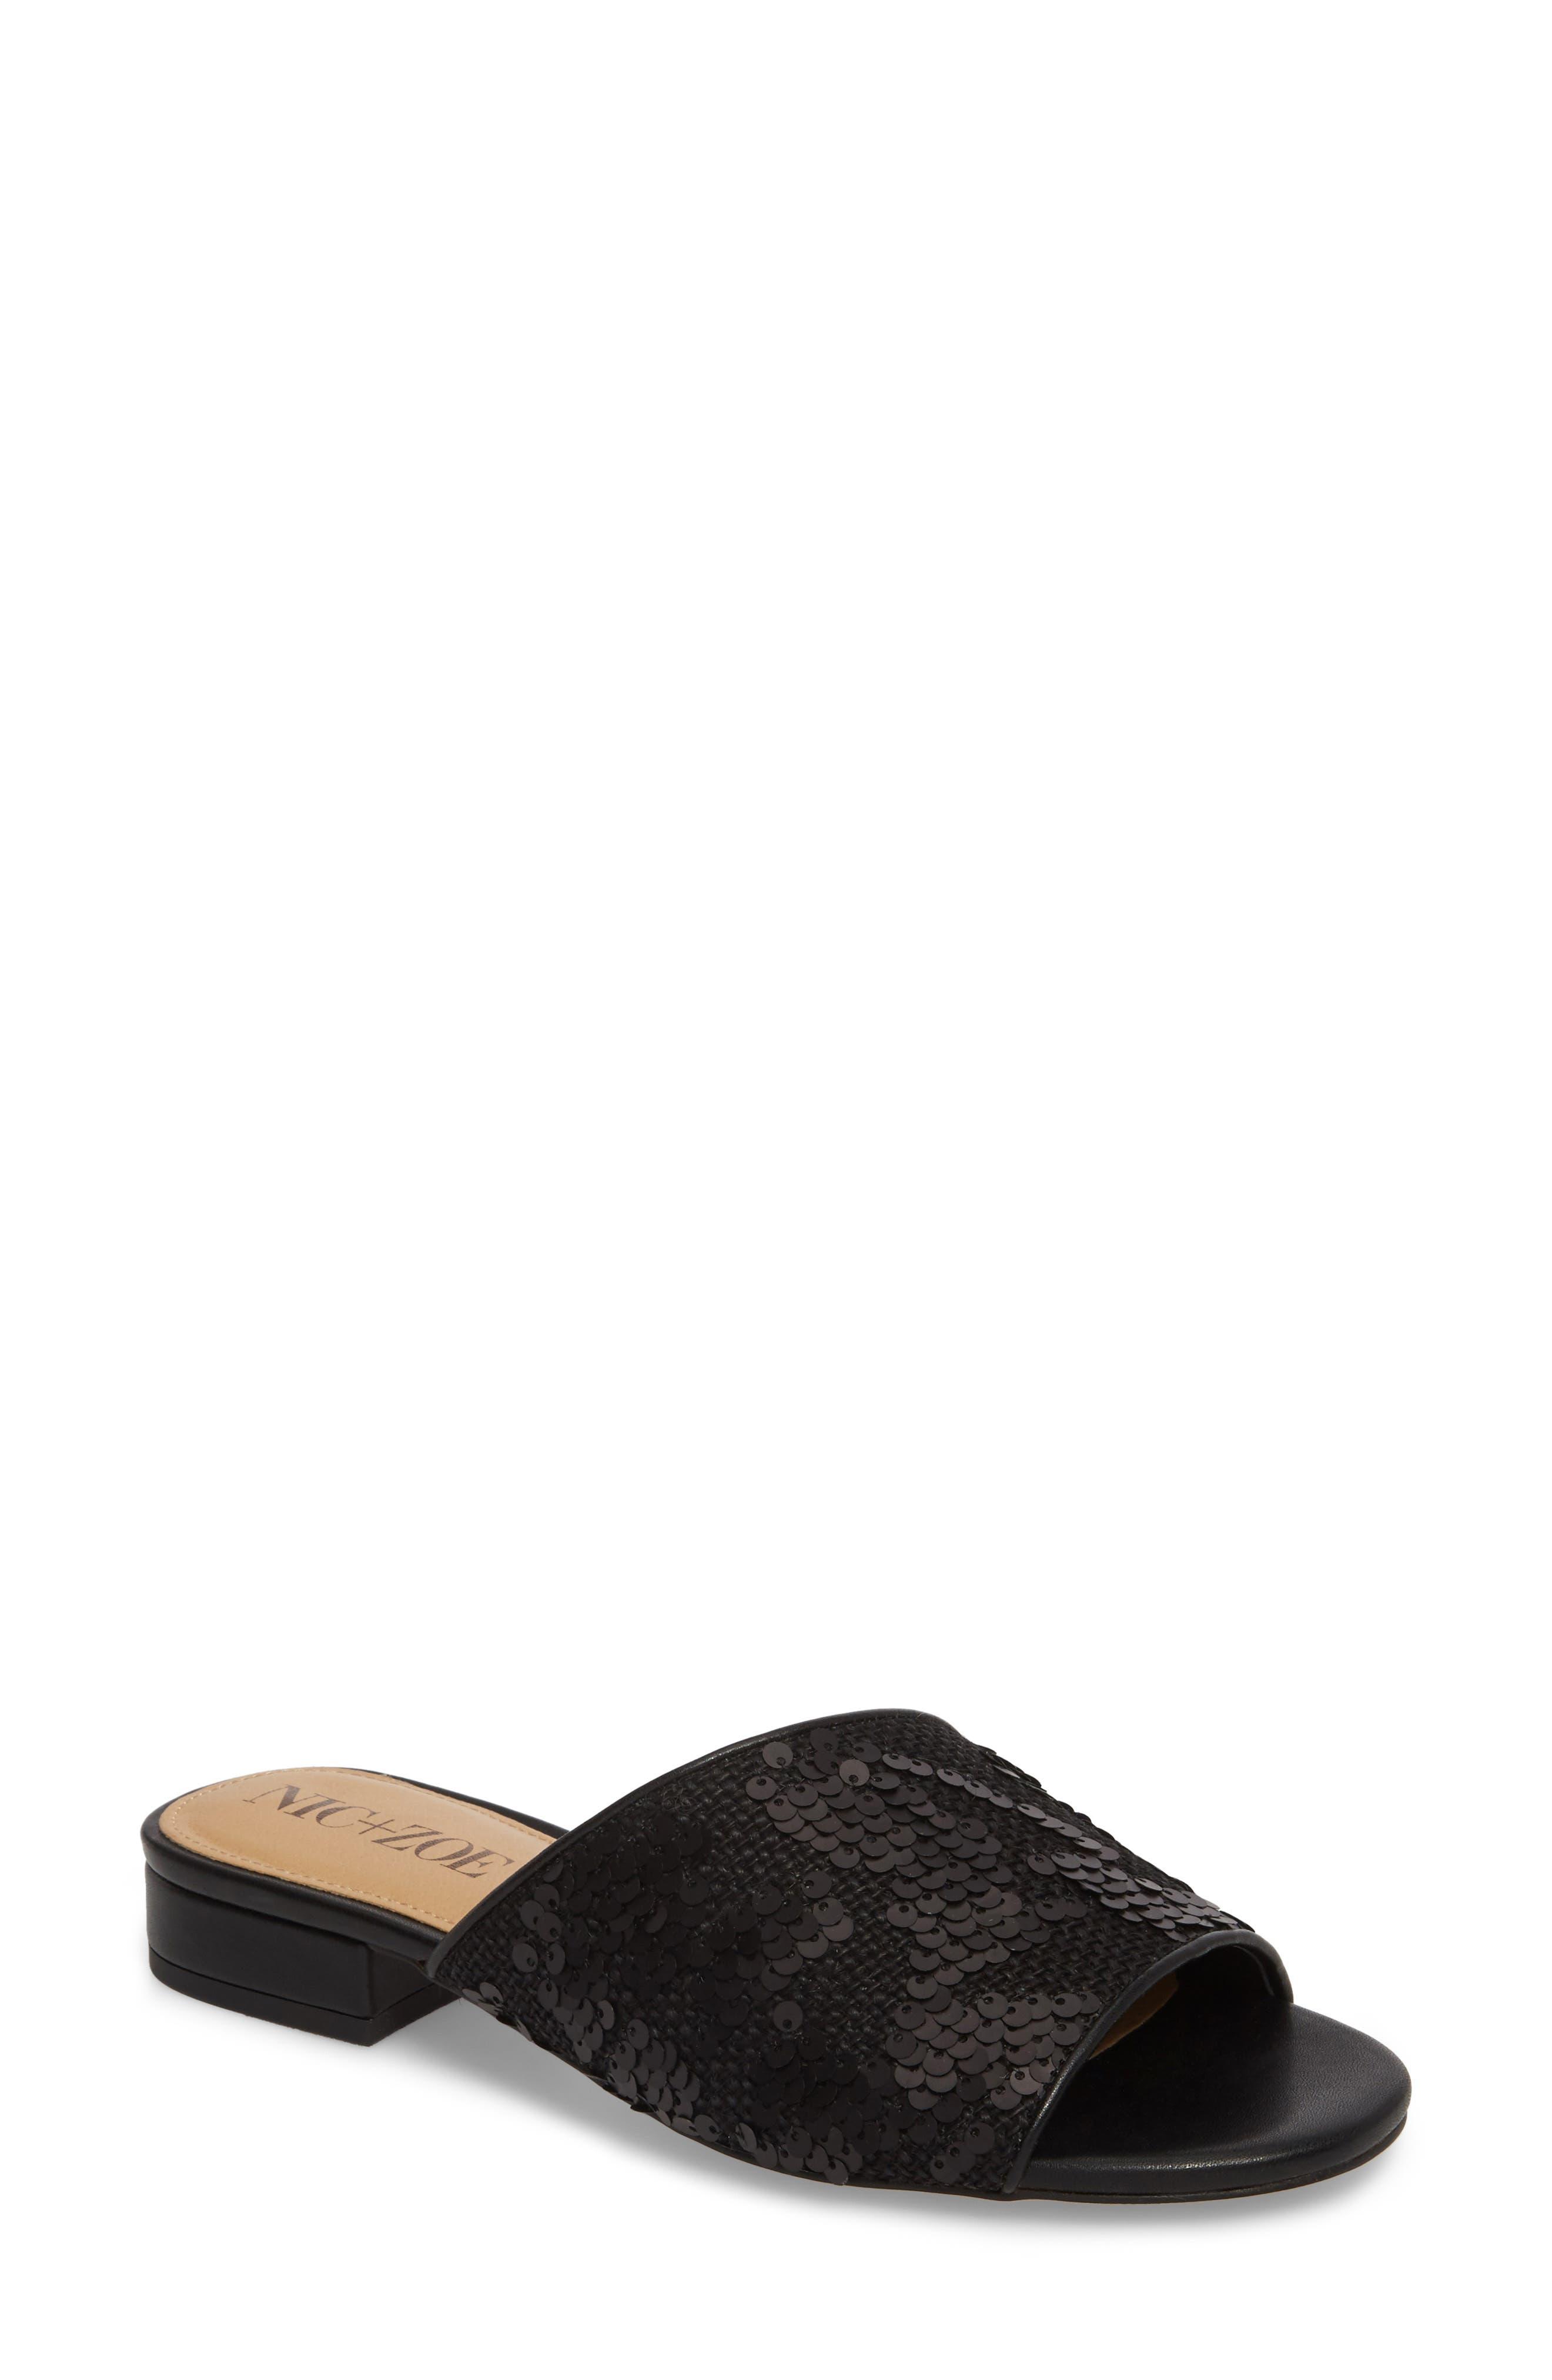 Stella Slide Sandal,                         Main,                         color, Black Sequin Fabric